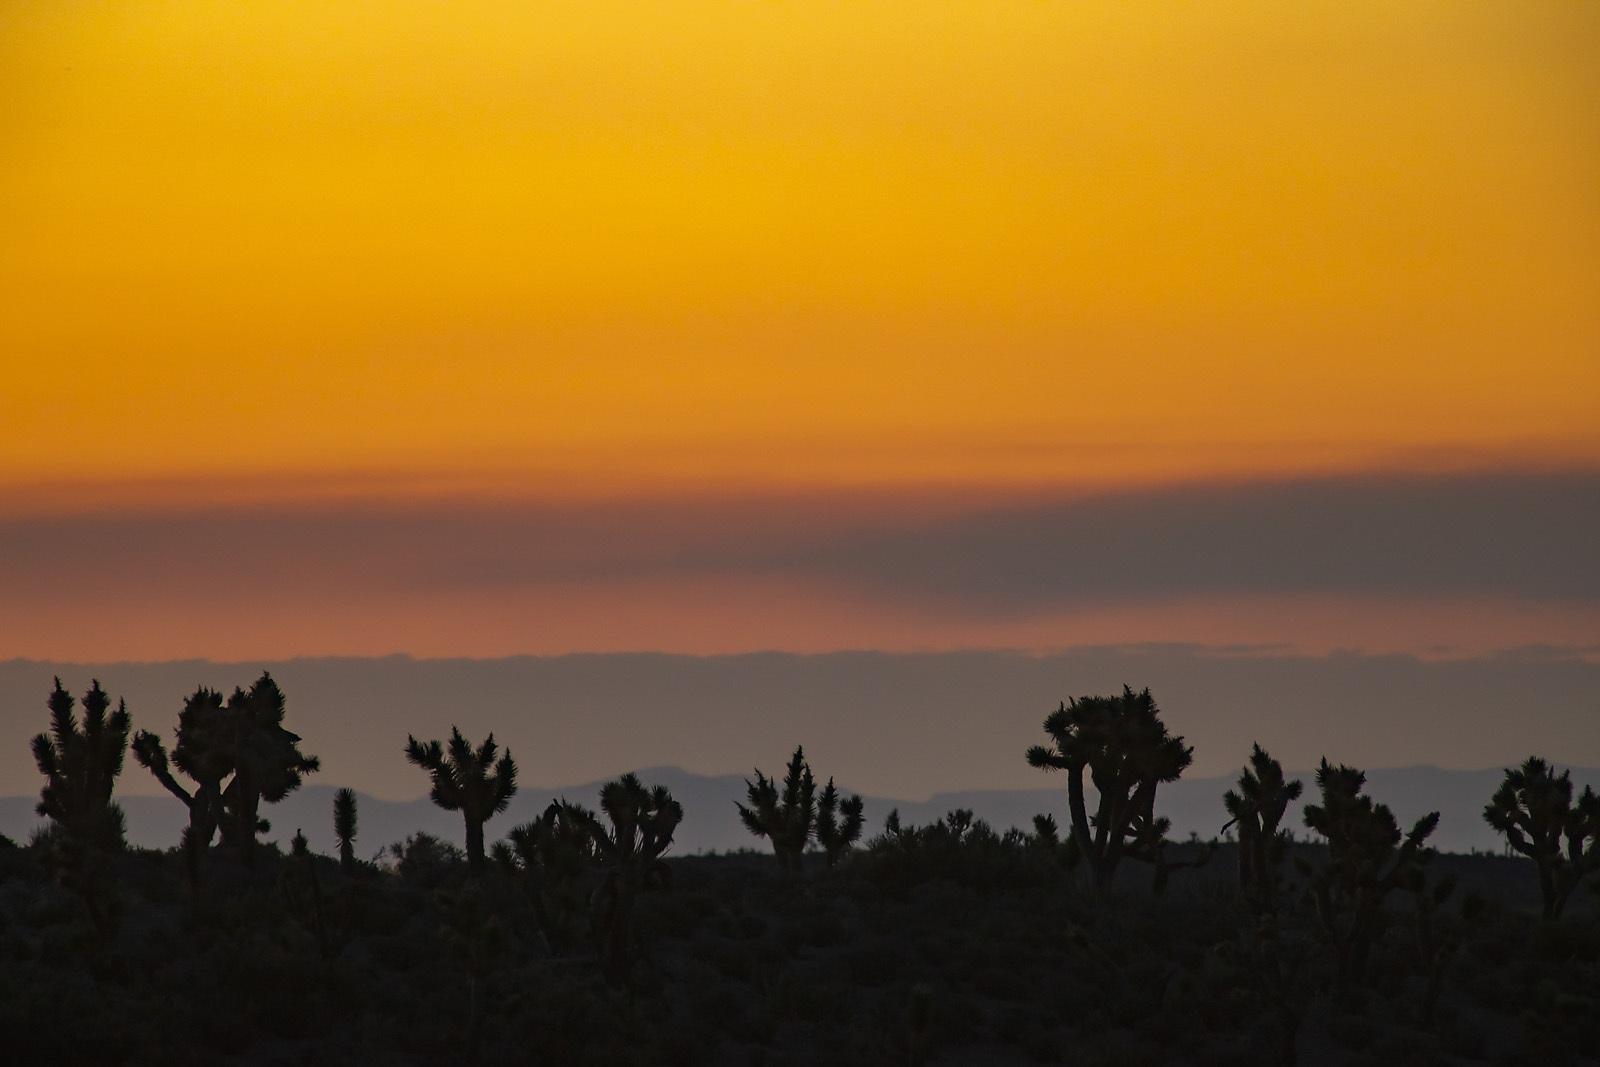 Nevada Scenic Landscape MG 4269 Desert Vista Vcnty Rte 156